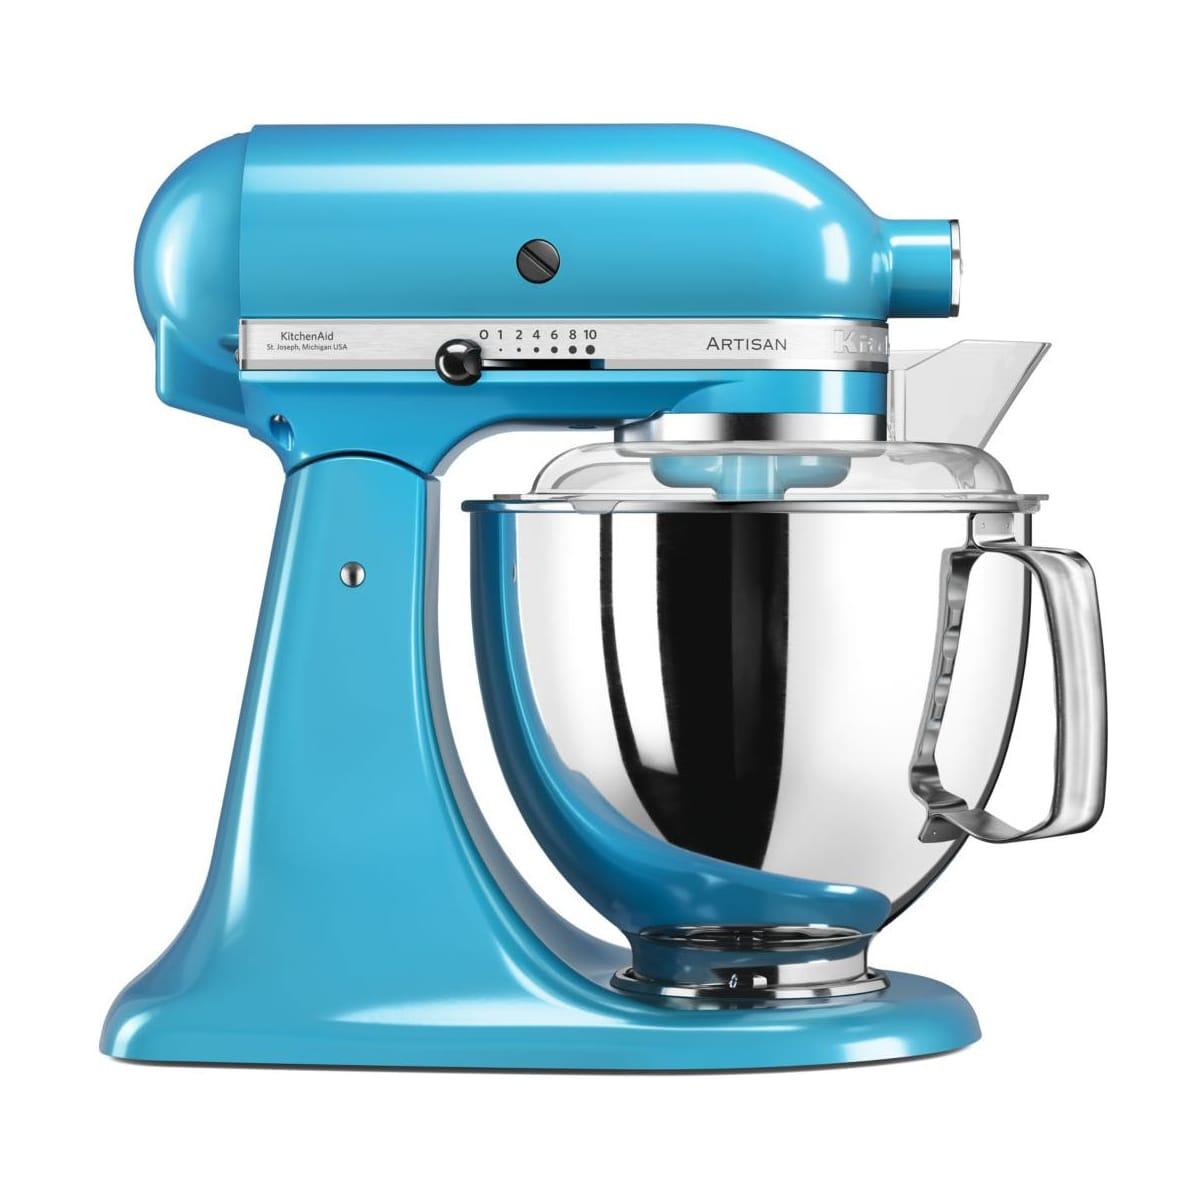 KitchenAid Artisan  5KSM175PS Robot pâtissier multifonction